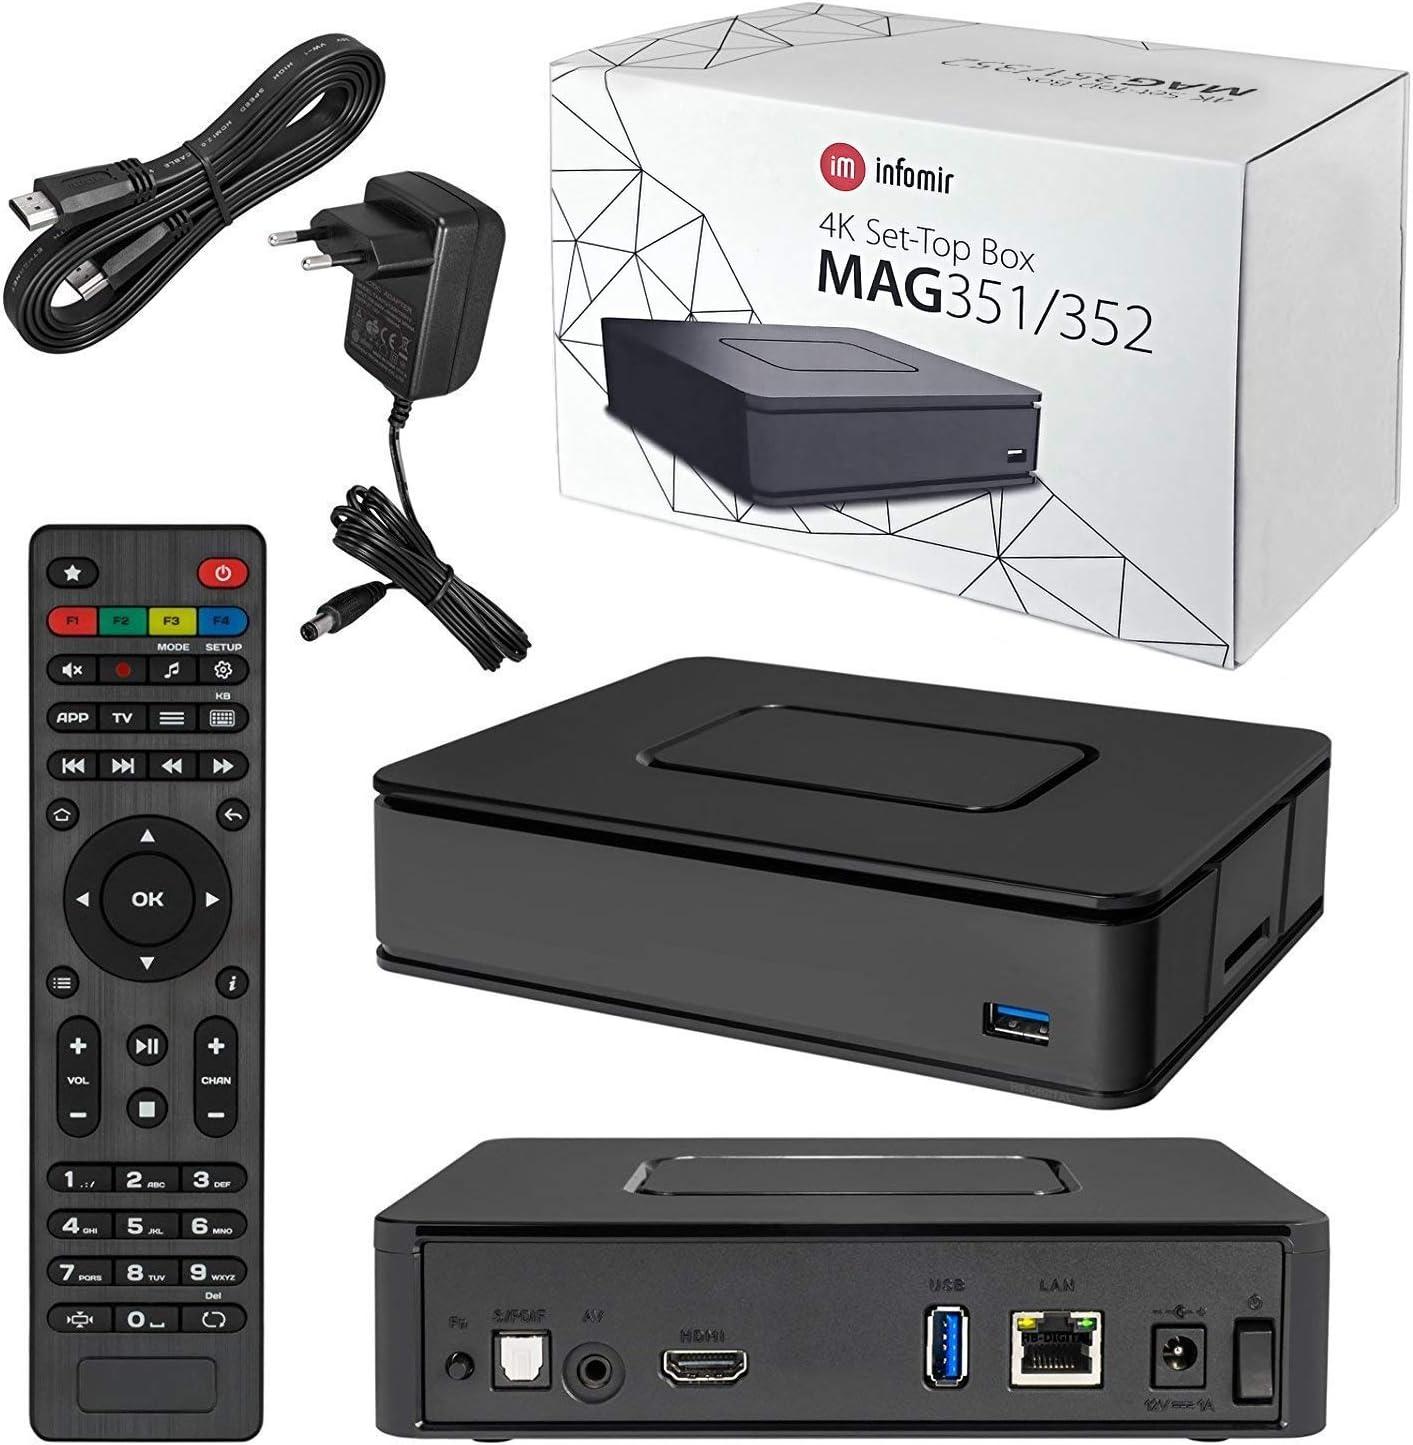 infomir Mag 352 Premium IPTV/OTT Set-Top Box, bcm75839, Linux 3.3, OpenGL es 2.0, hevc, 512 MB flash/1 GB de RAM: Amazon.es: Electrónica